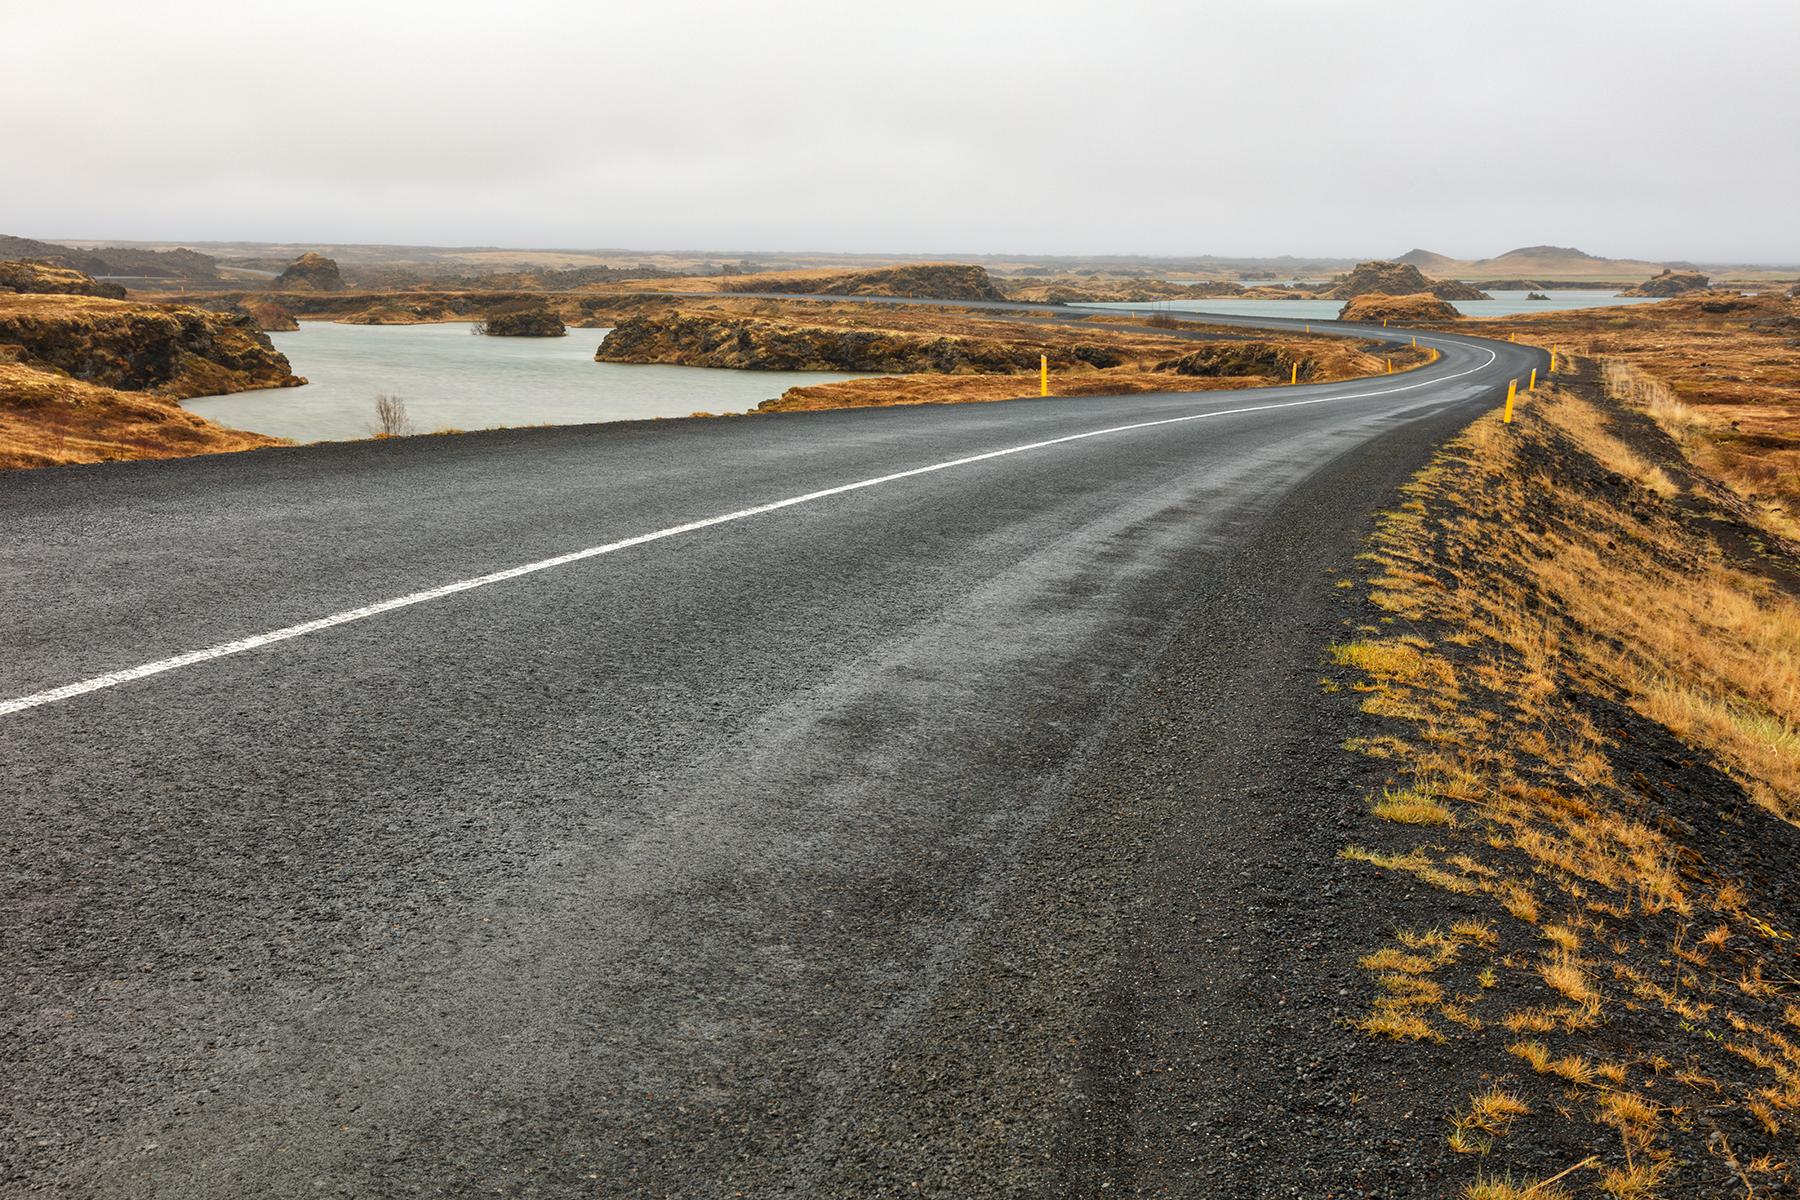 Winding Iceland Road - Hofdi, Asphalt, Ponds, Rural, Rugged, HQ Photo